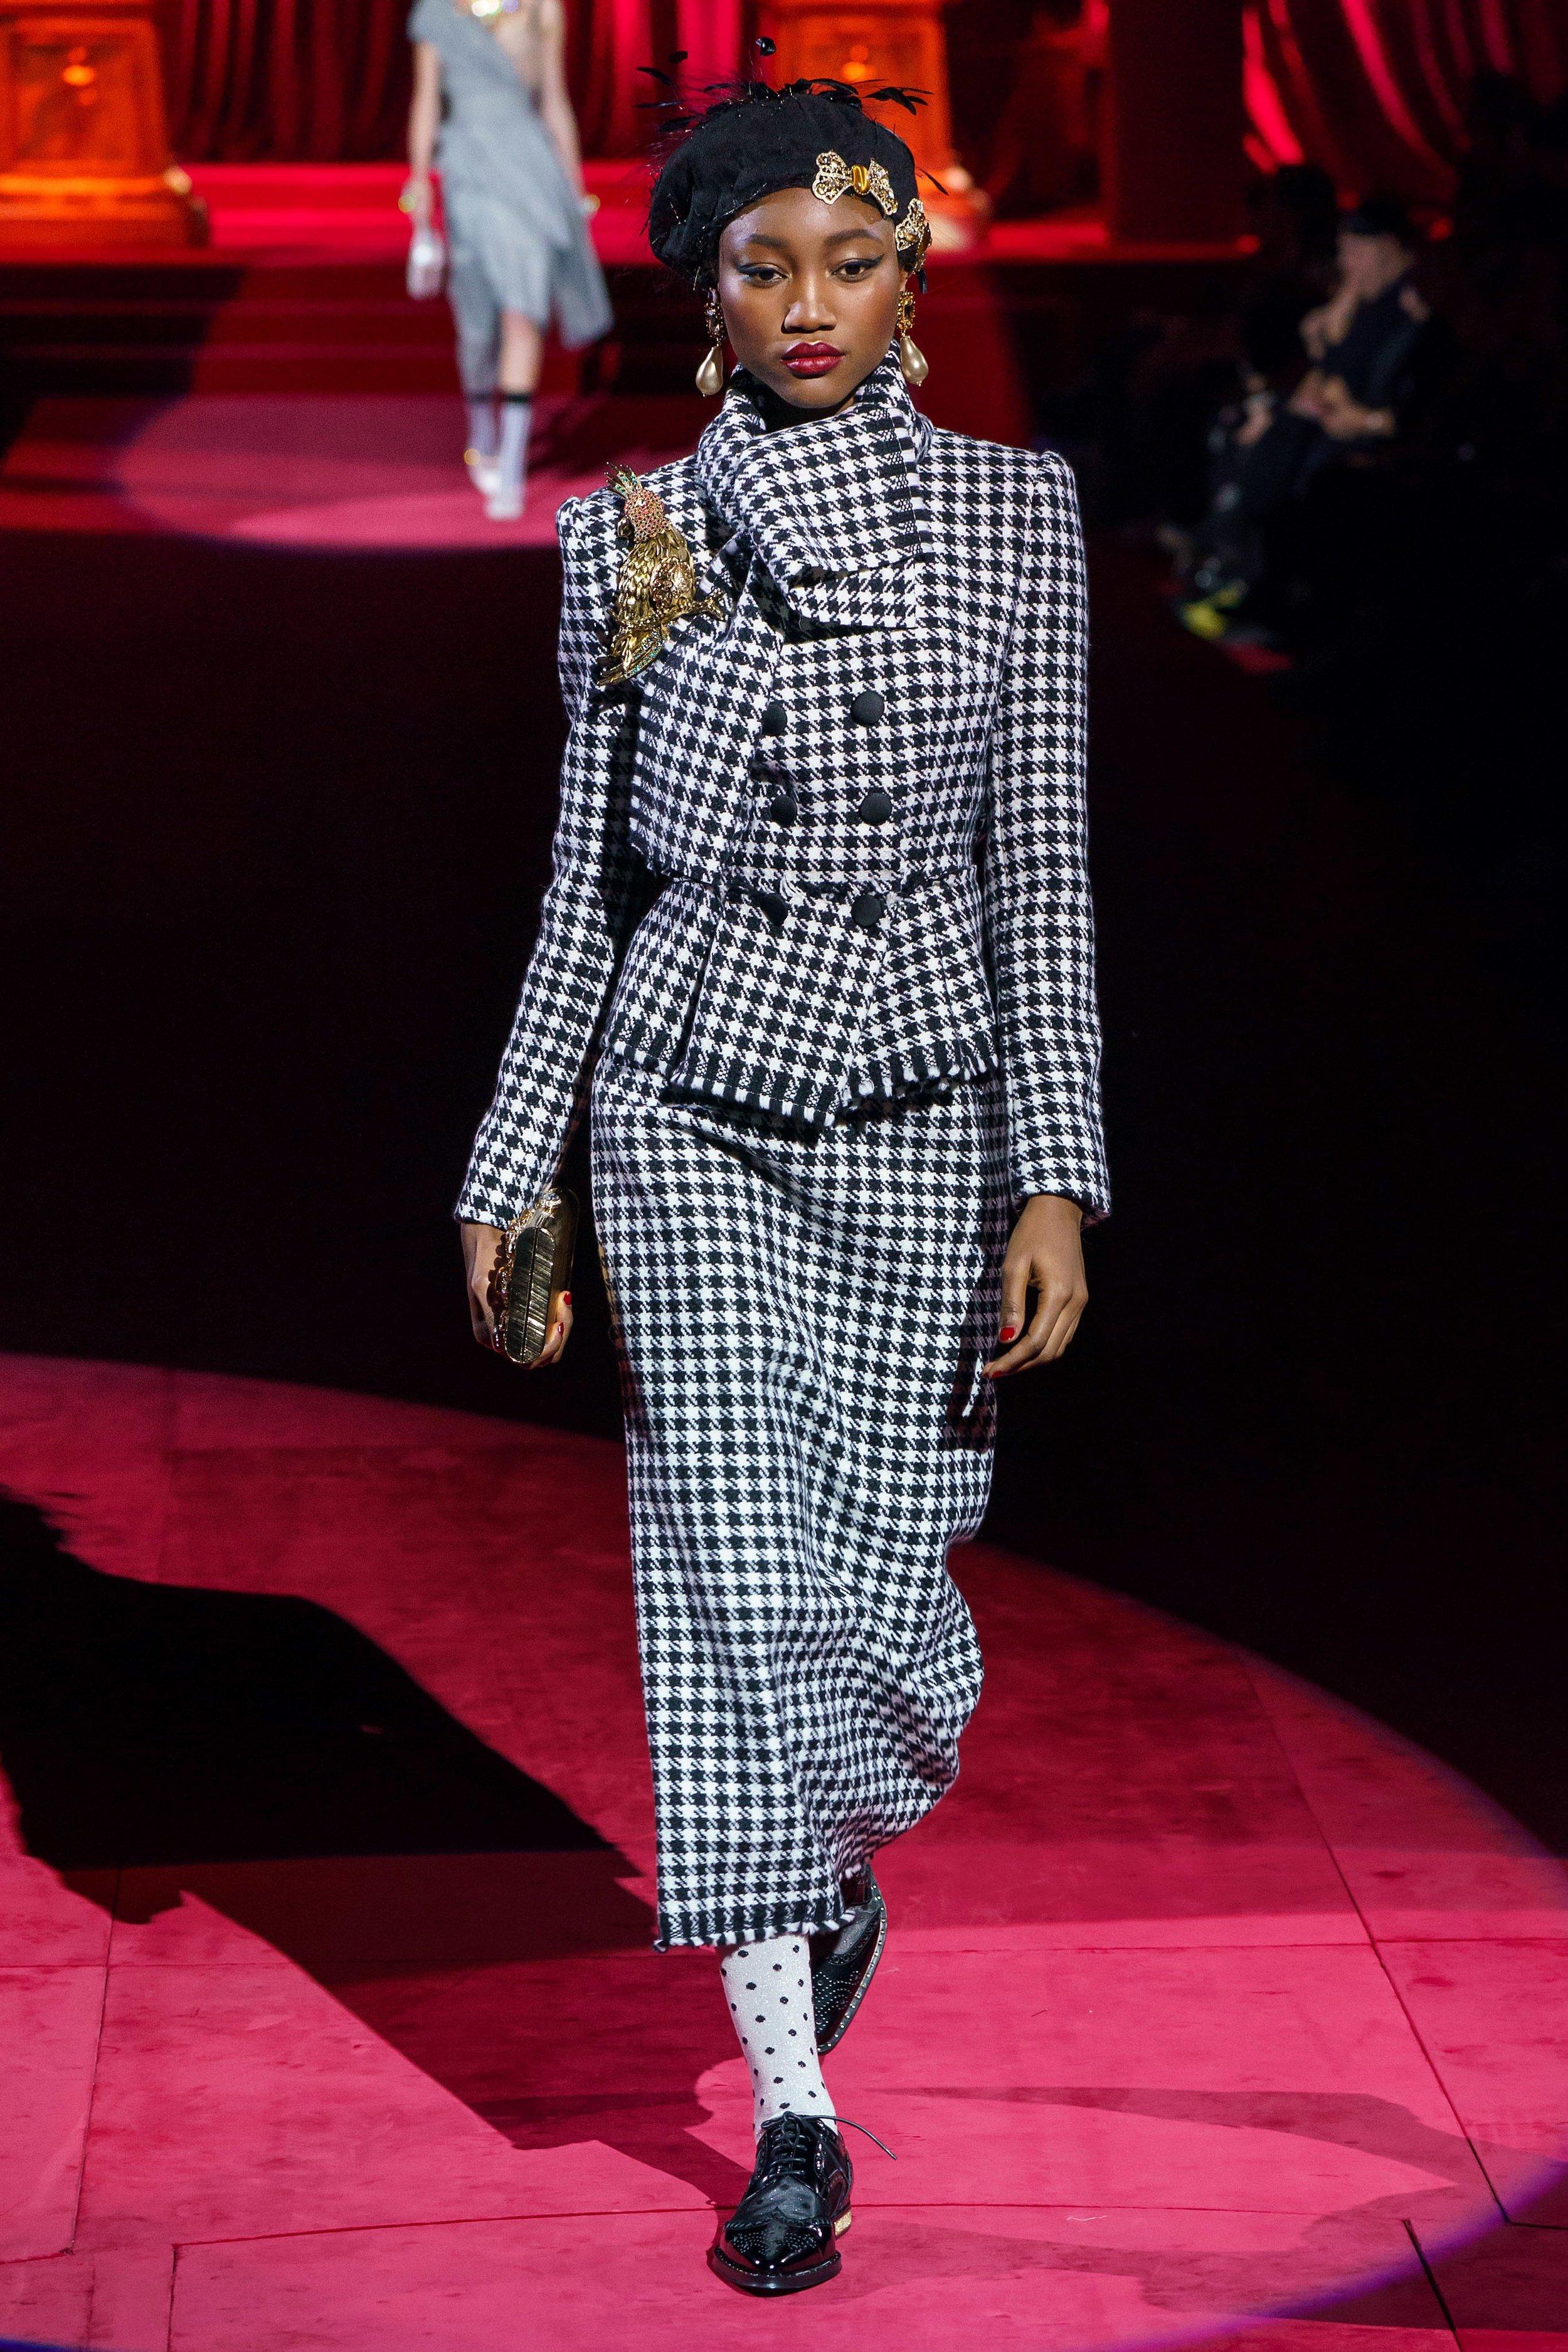 Eniola Abioro walking for Dolce and Gabbana Fall 2019 Ready-to-Wear. Photo: Alessandro Lucioni / Gorunway.com